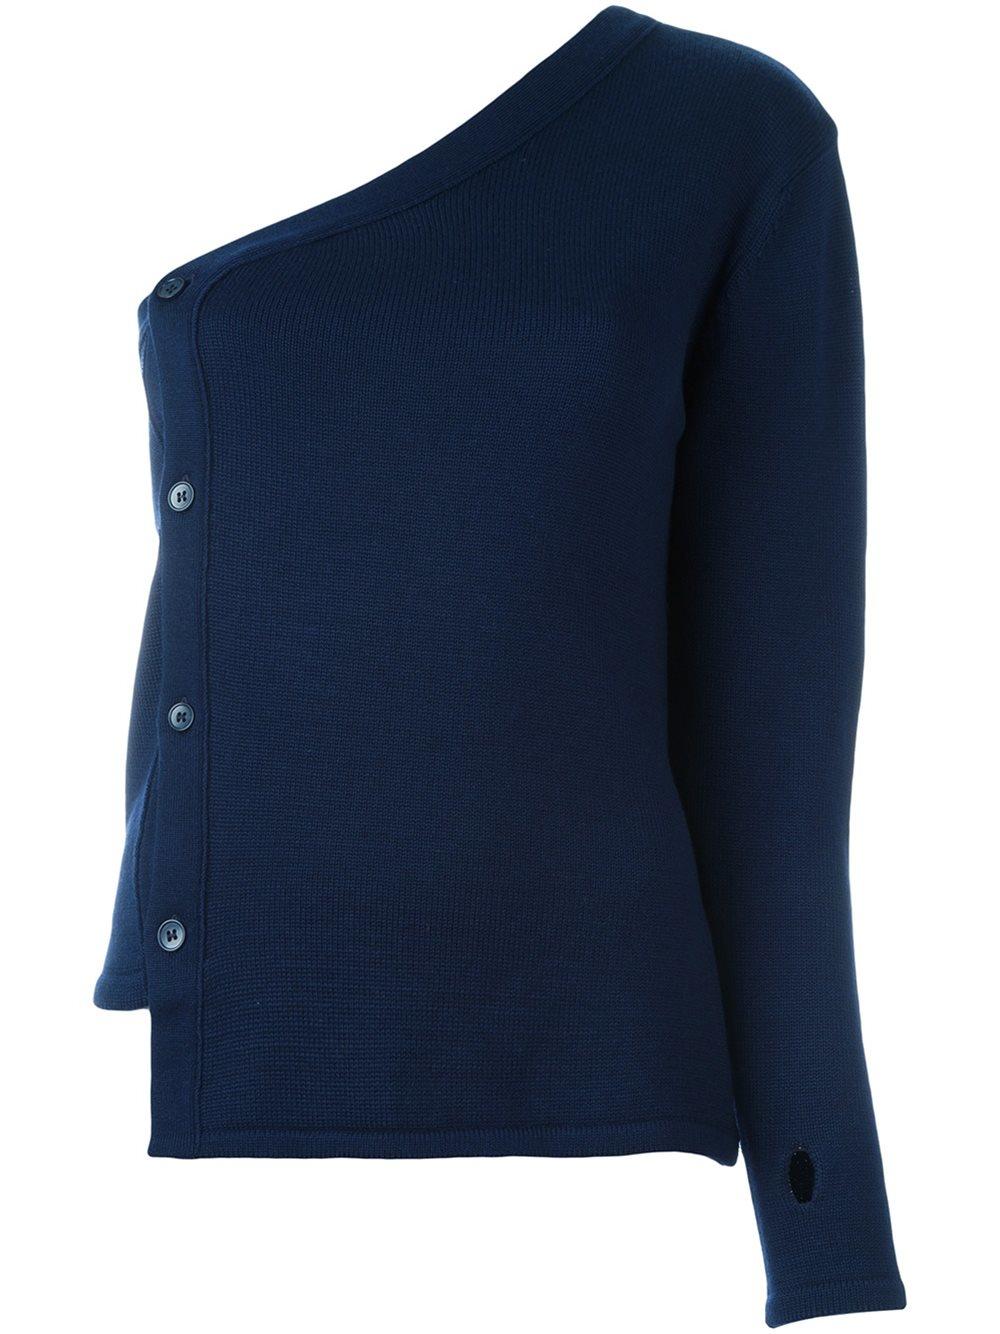 jacquemus one shoulder sweater in blue lyst. Black Bedroom Furniture Sets. Home Design Ideas